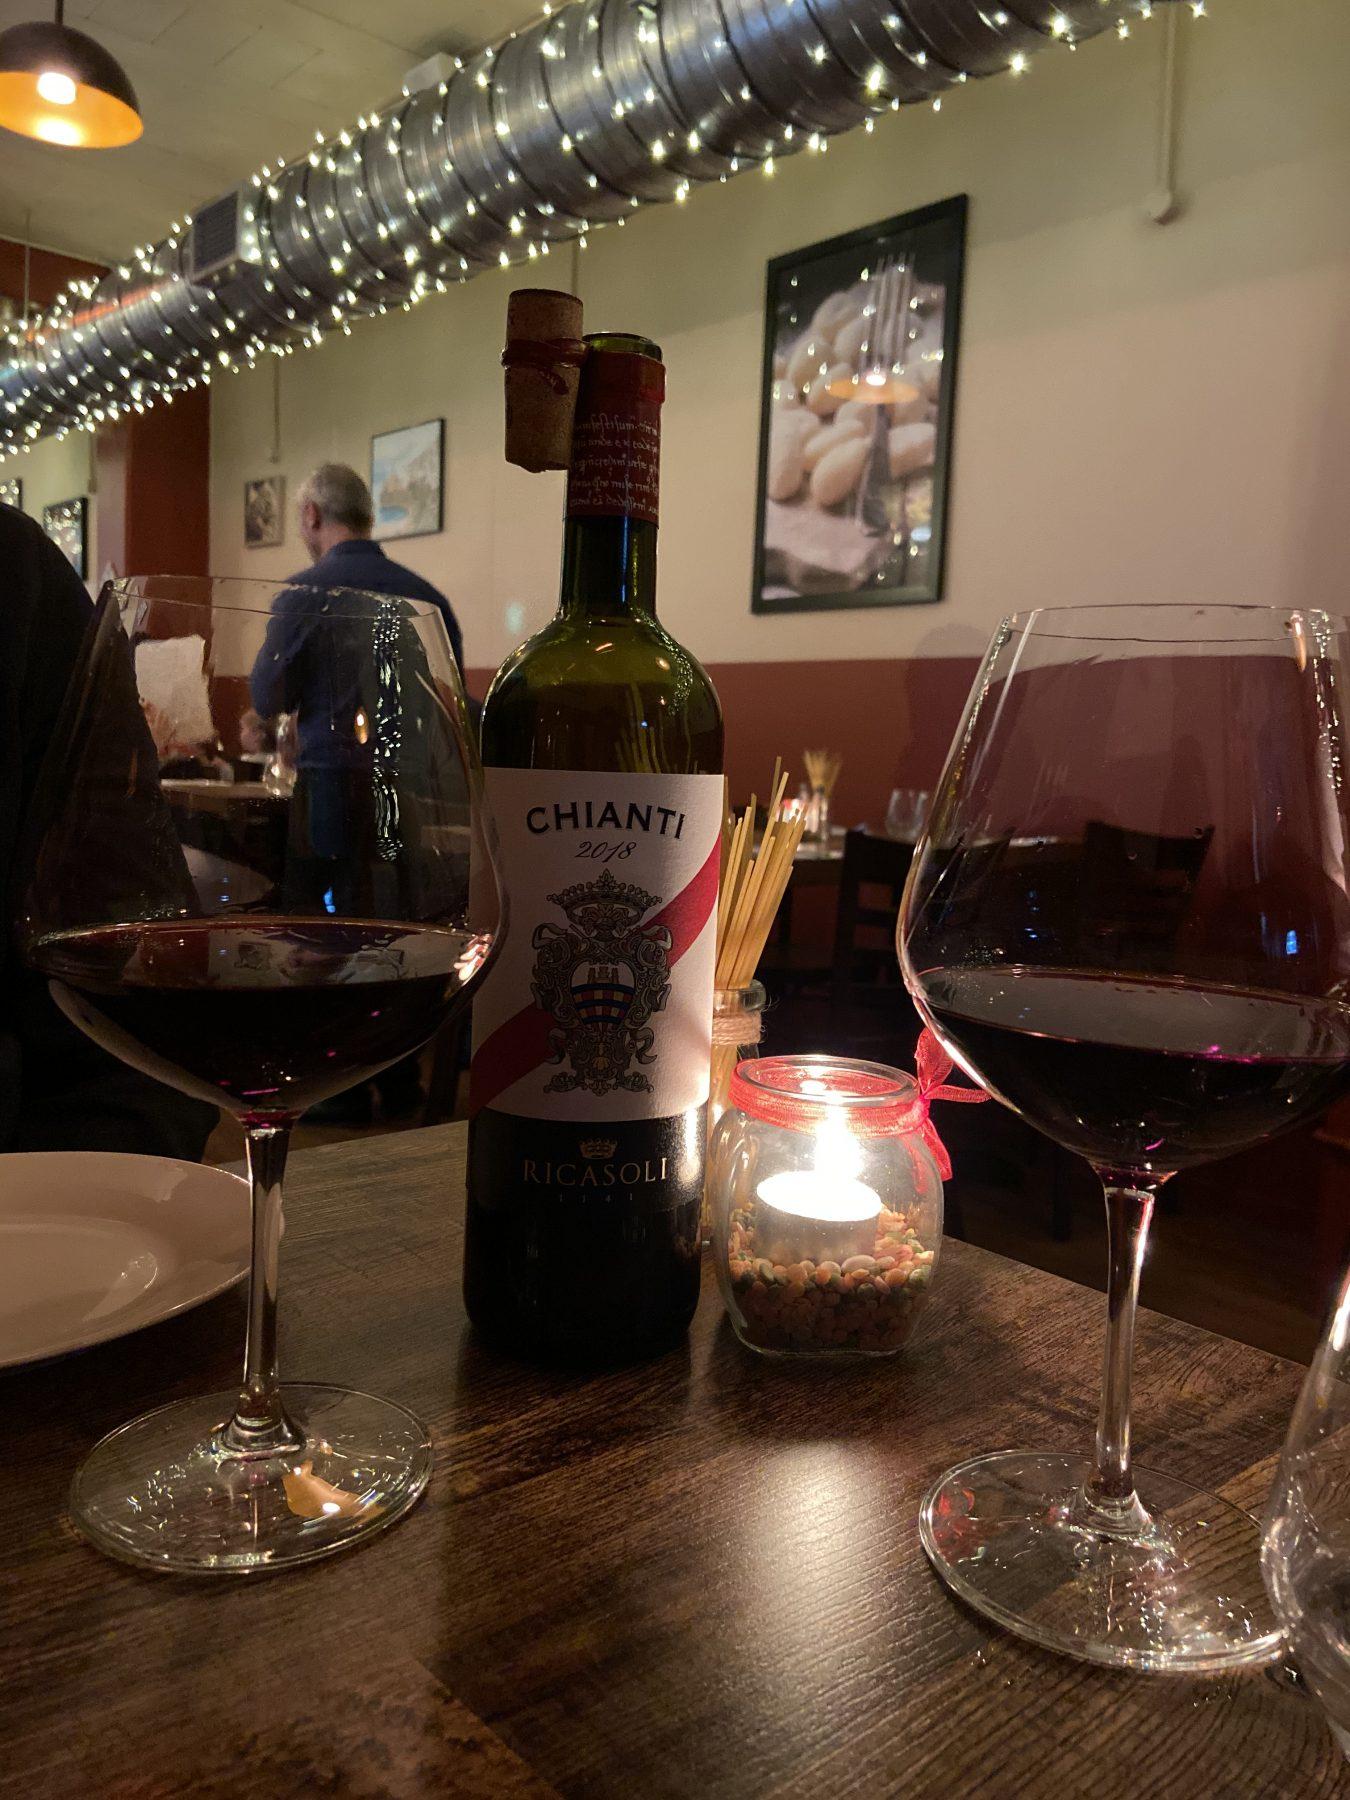 Puglia Italian Restaurant Kingsland Chianti Wine